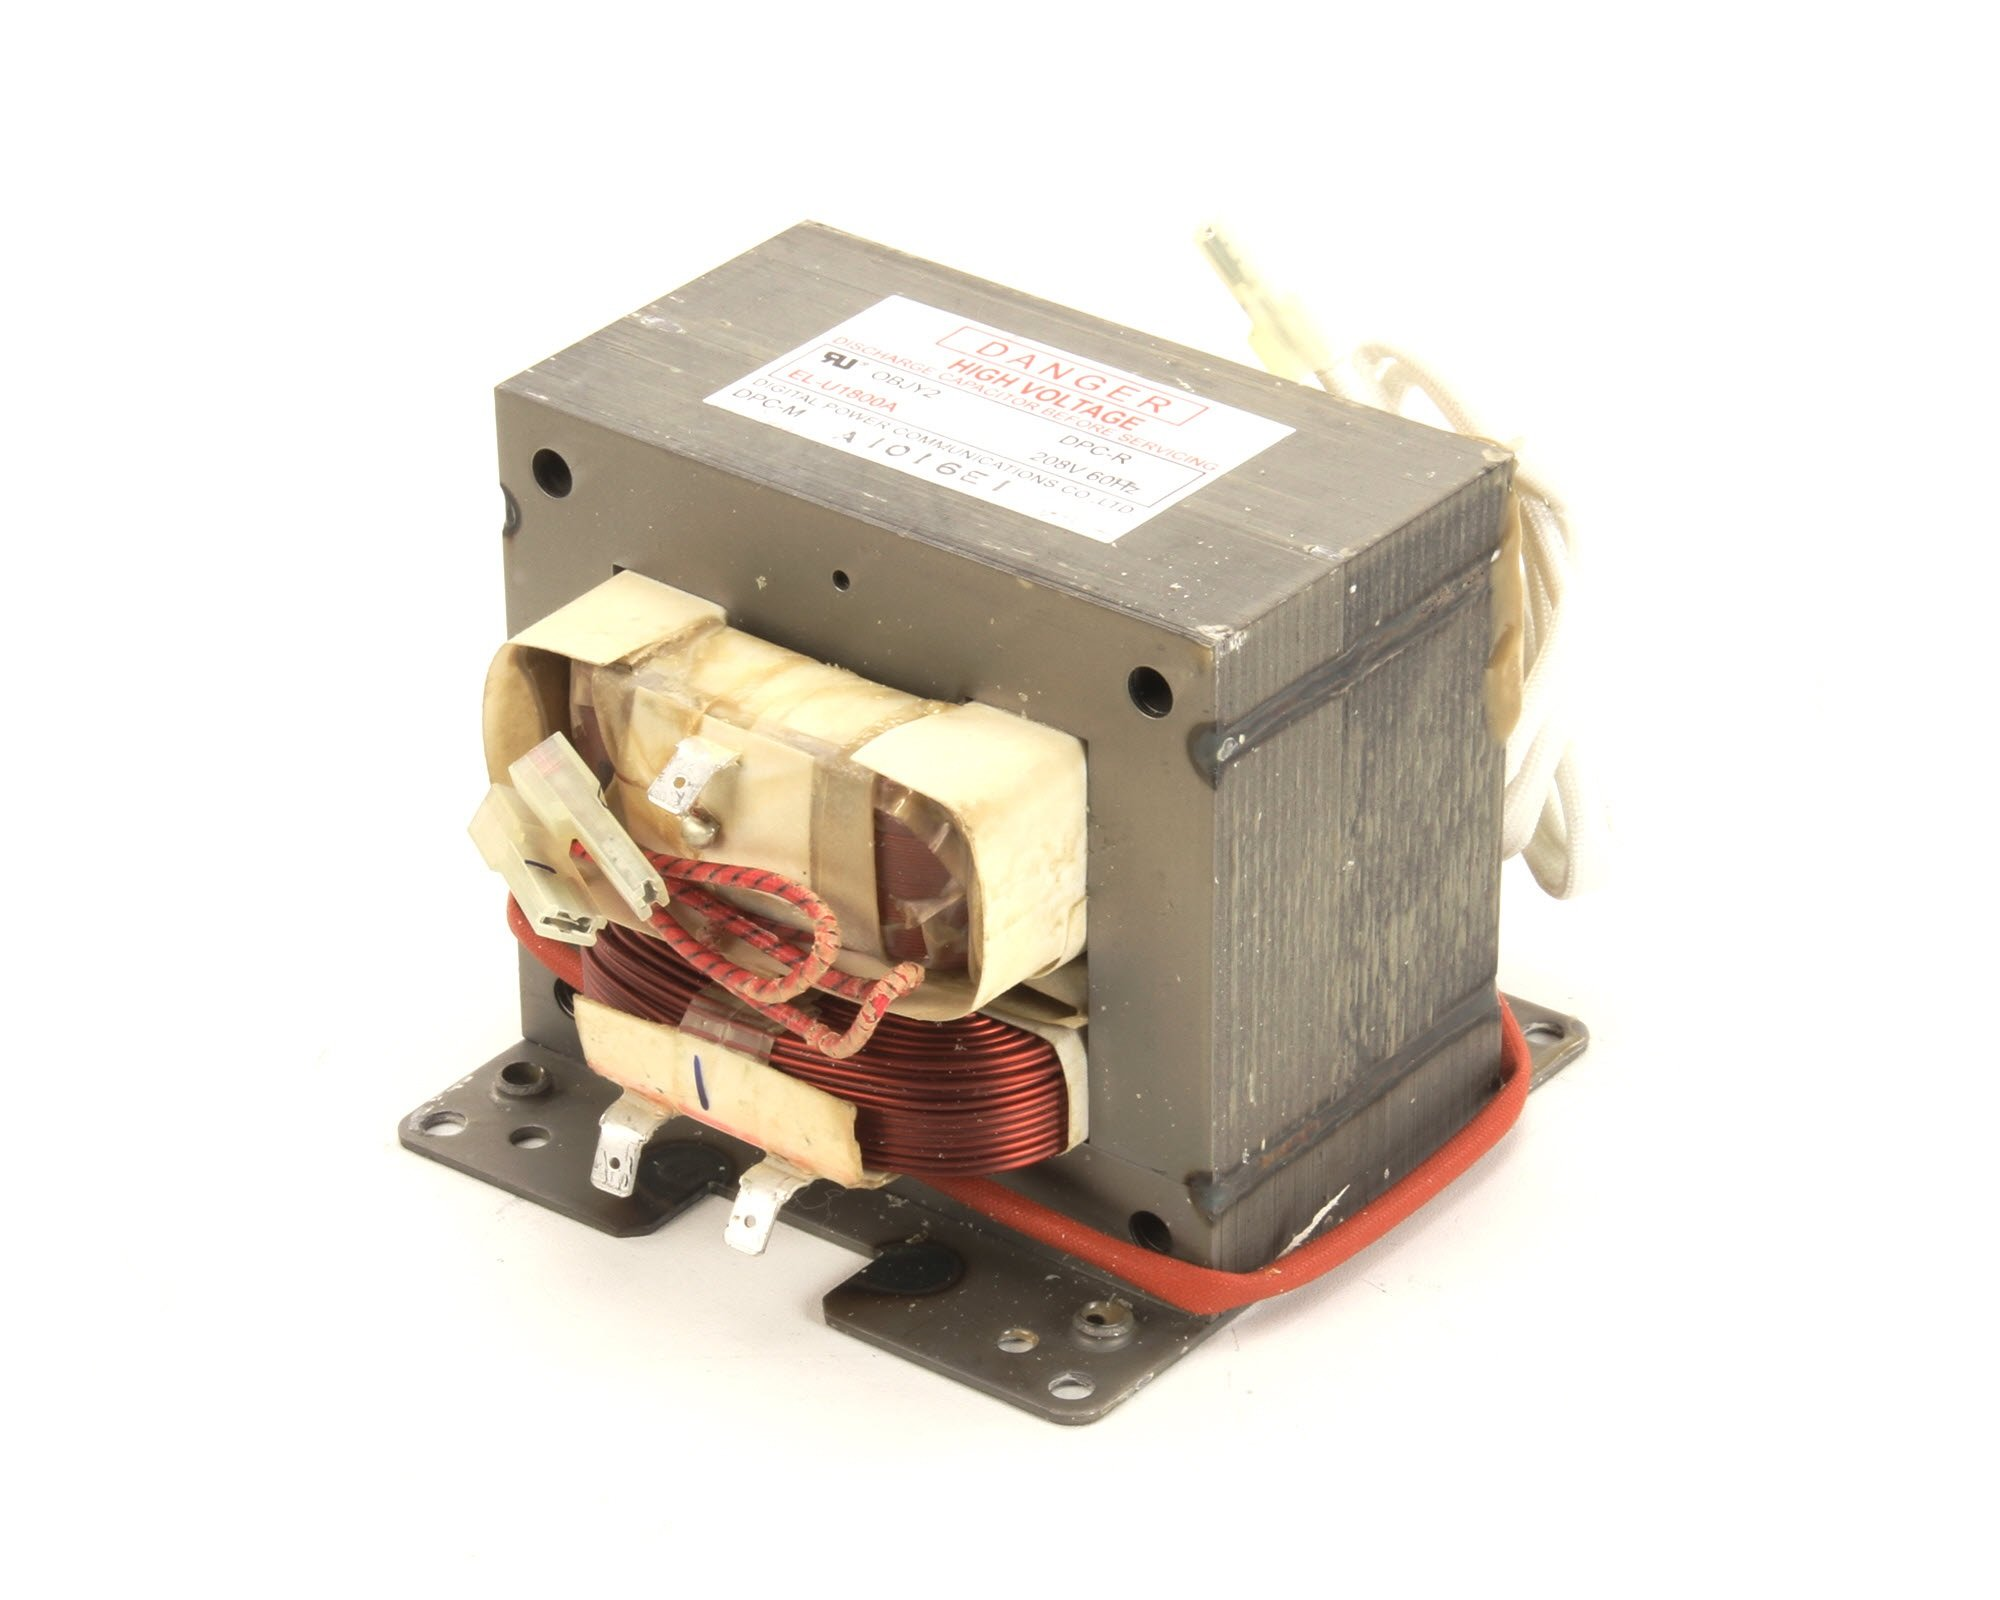 Electrolux 0D6858 208 Volt Emb Hspp Ki Transformer